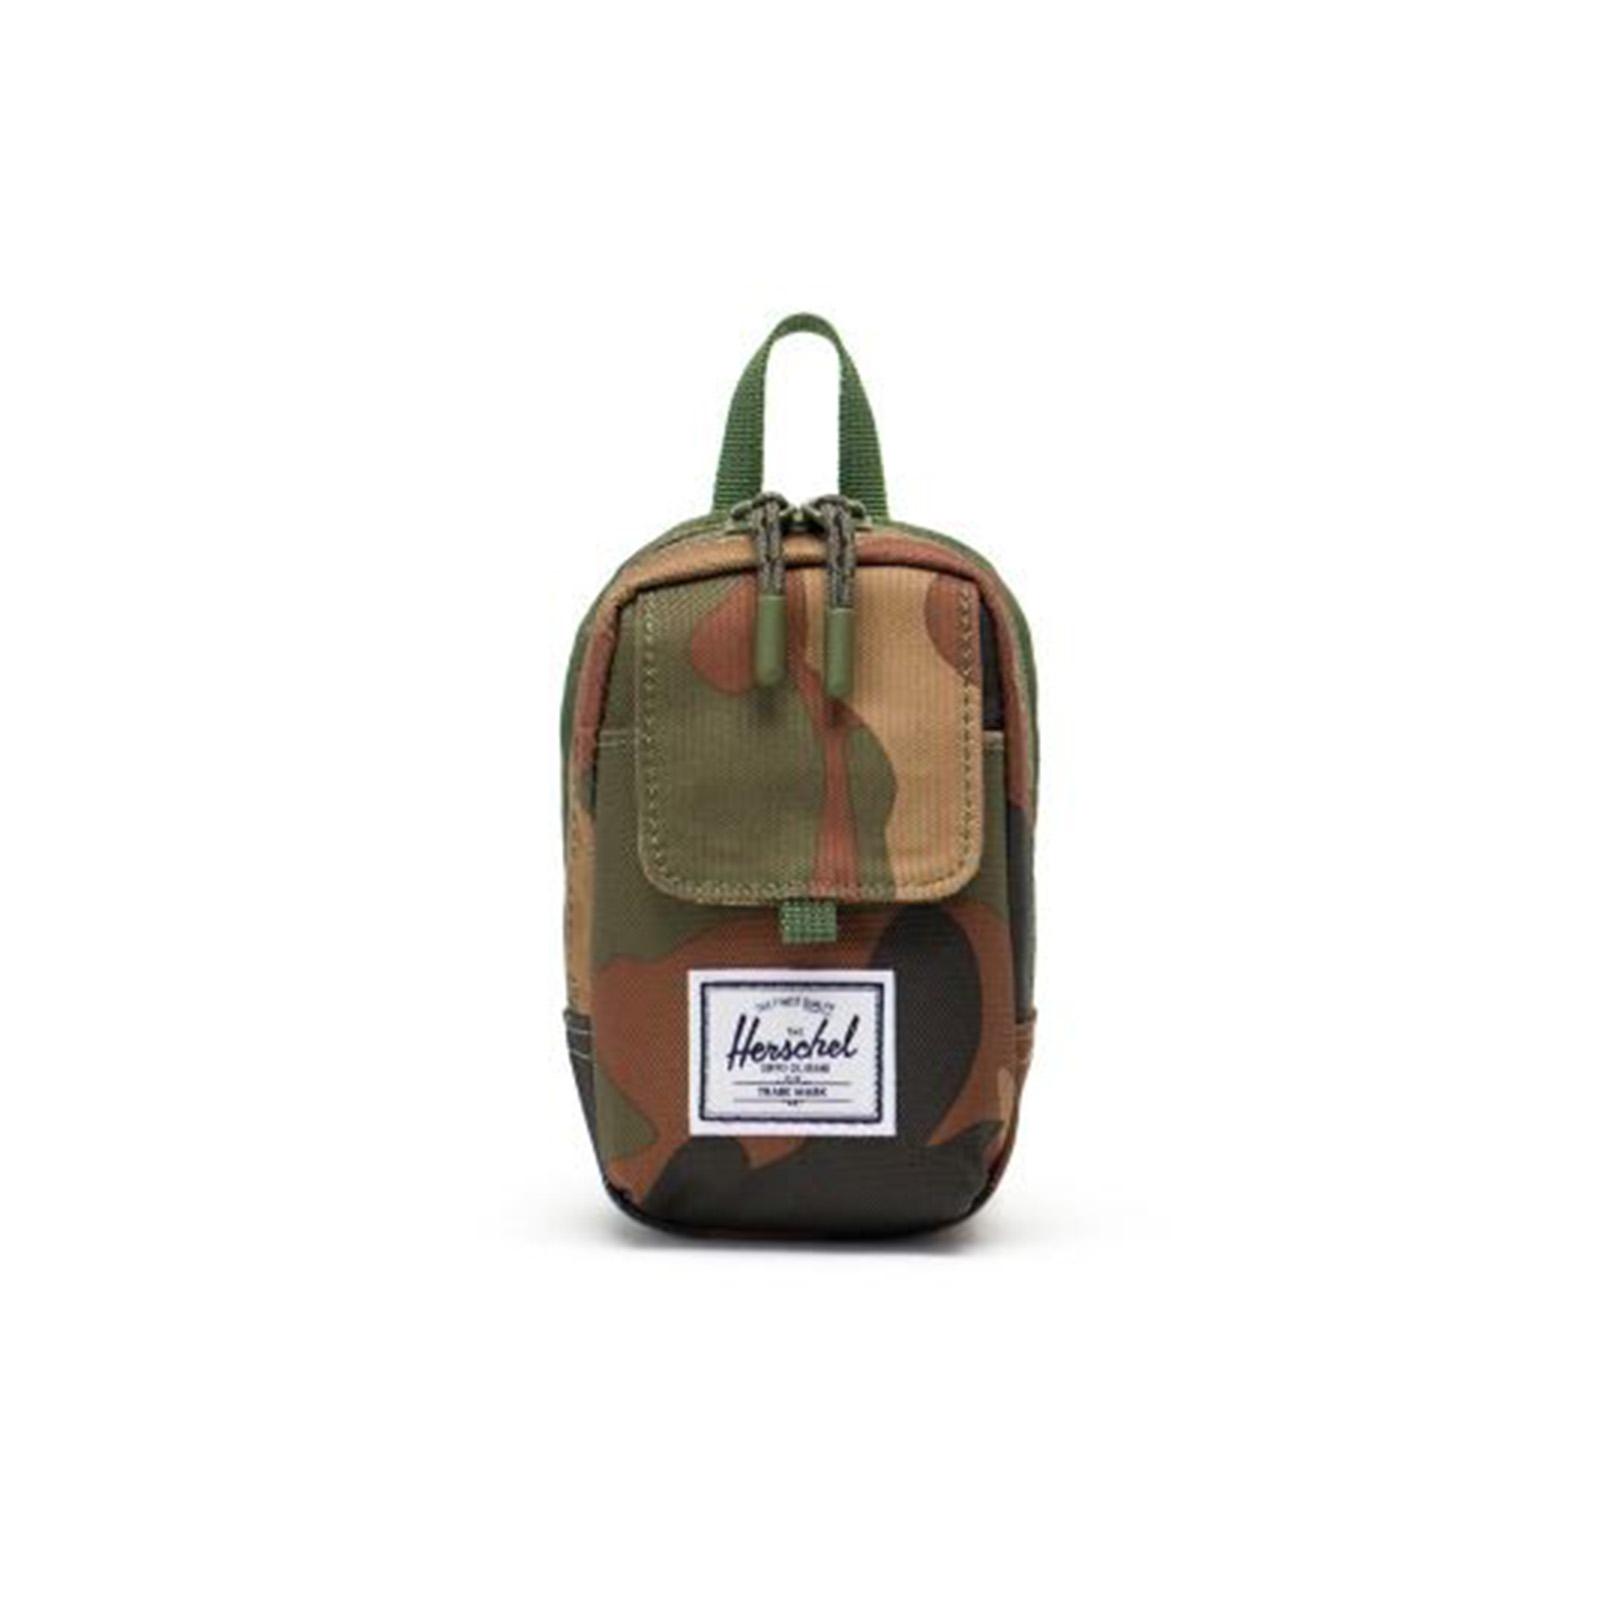 bde4bb133f0 Herschel Form Crossbody Small - Woodland Camo - Shoulder Bag Camo